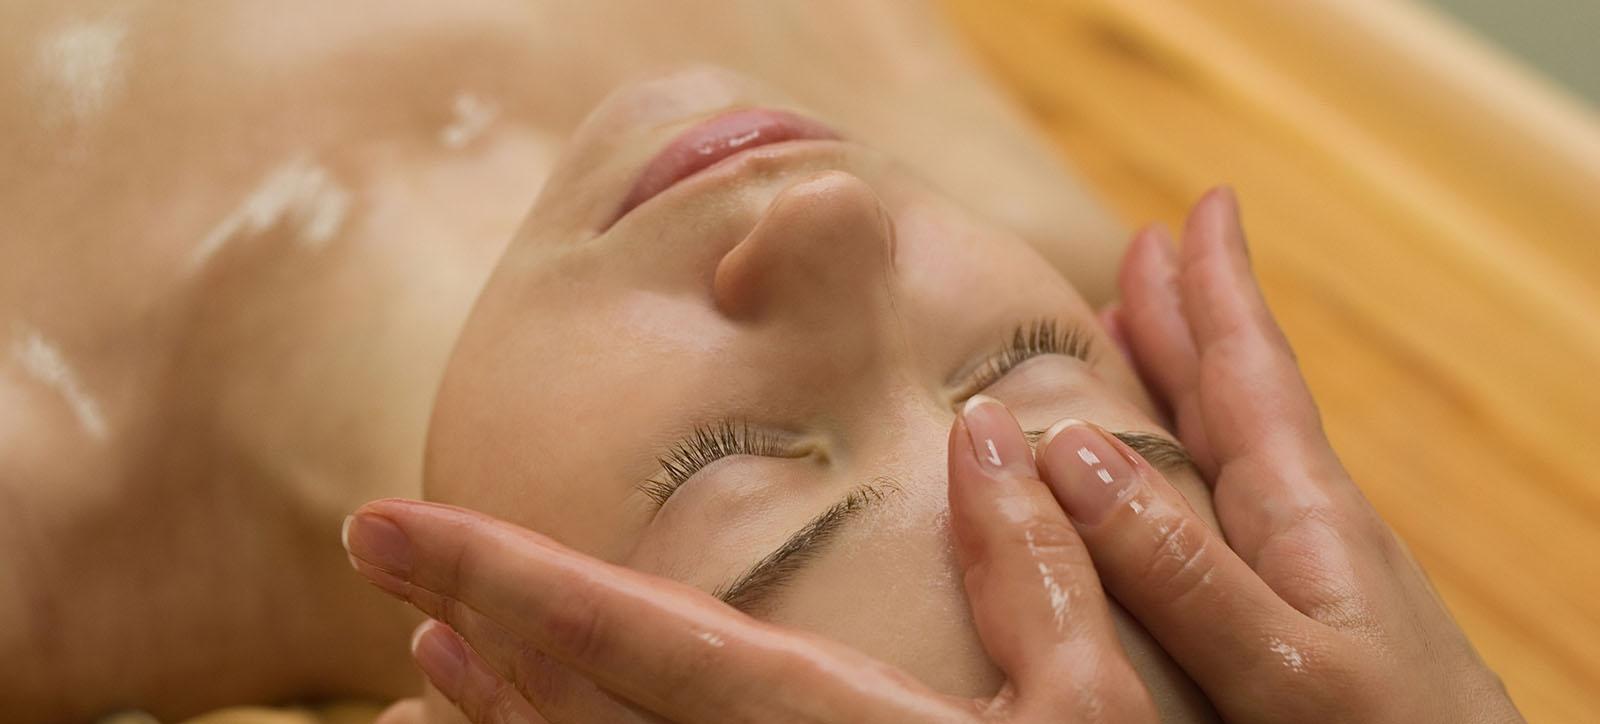 Linta\\\'s Ayurveda center: Ayurvedic treatments in Kerala, India